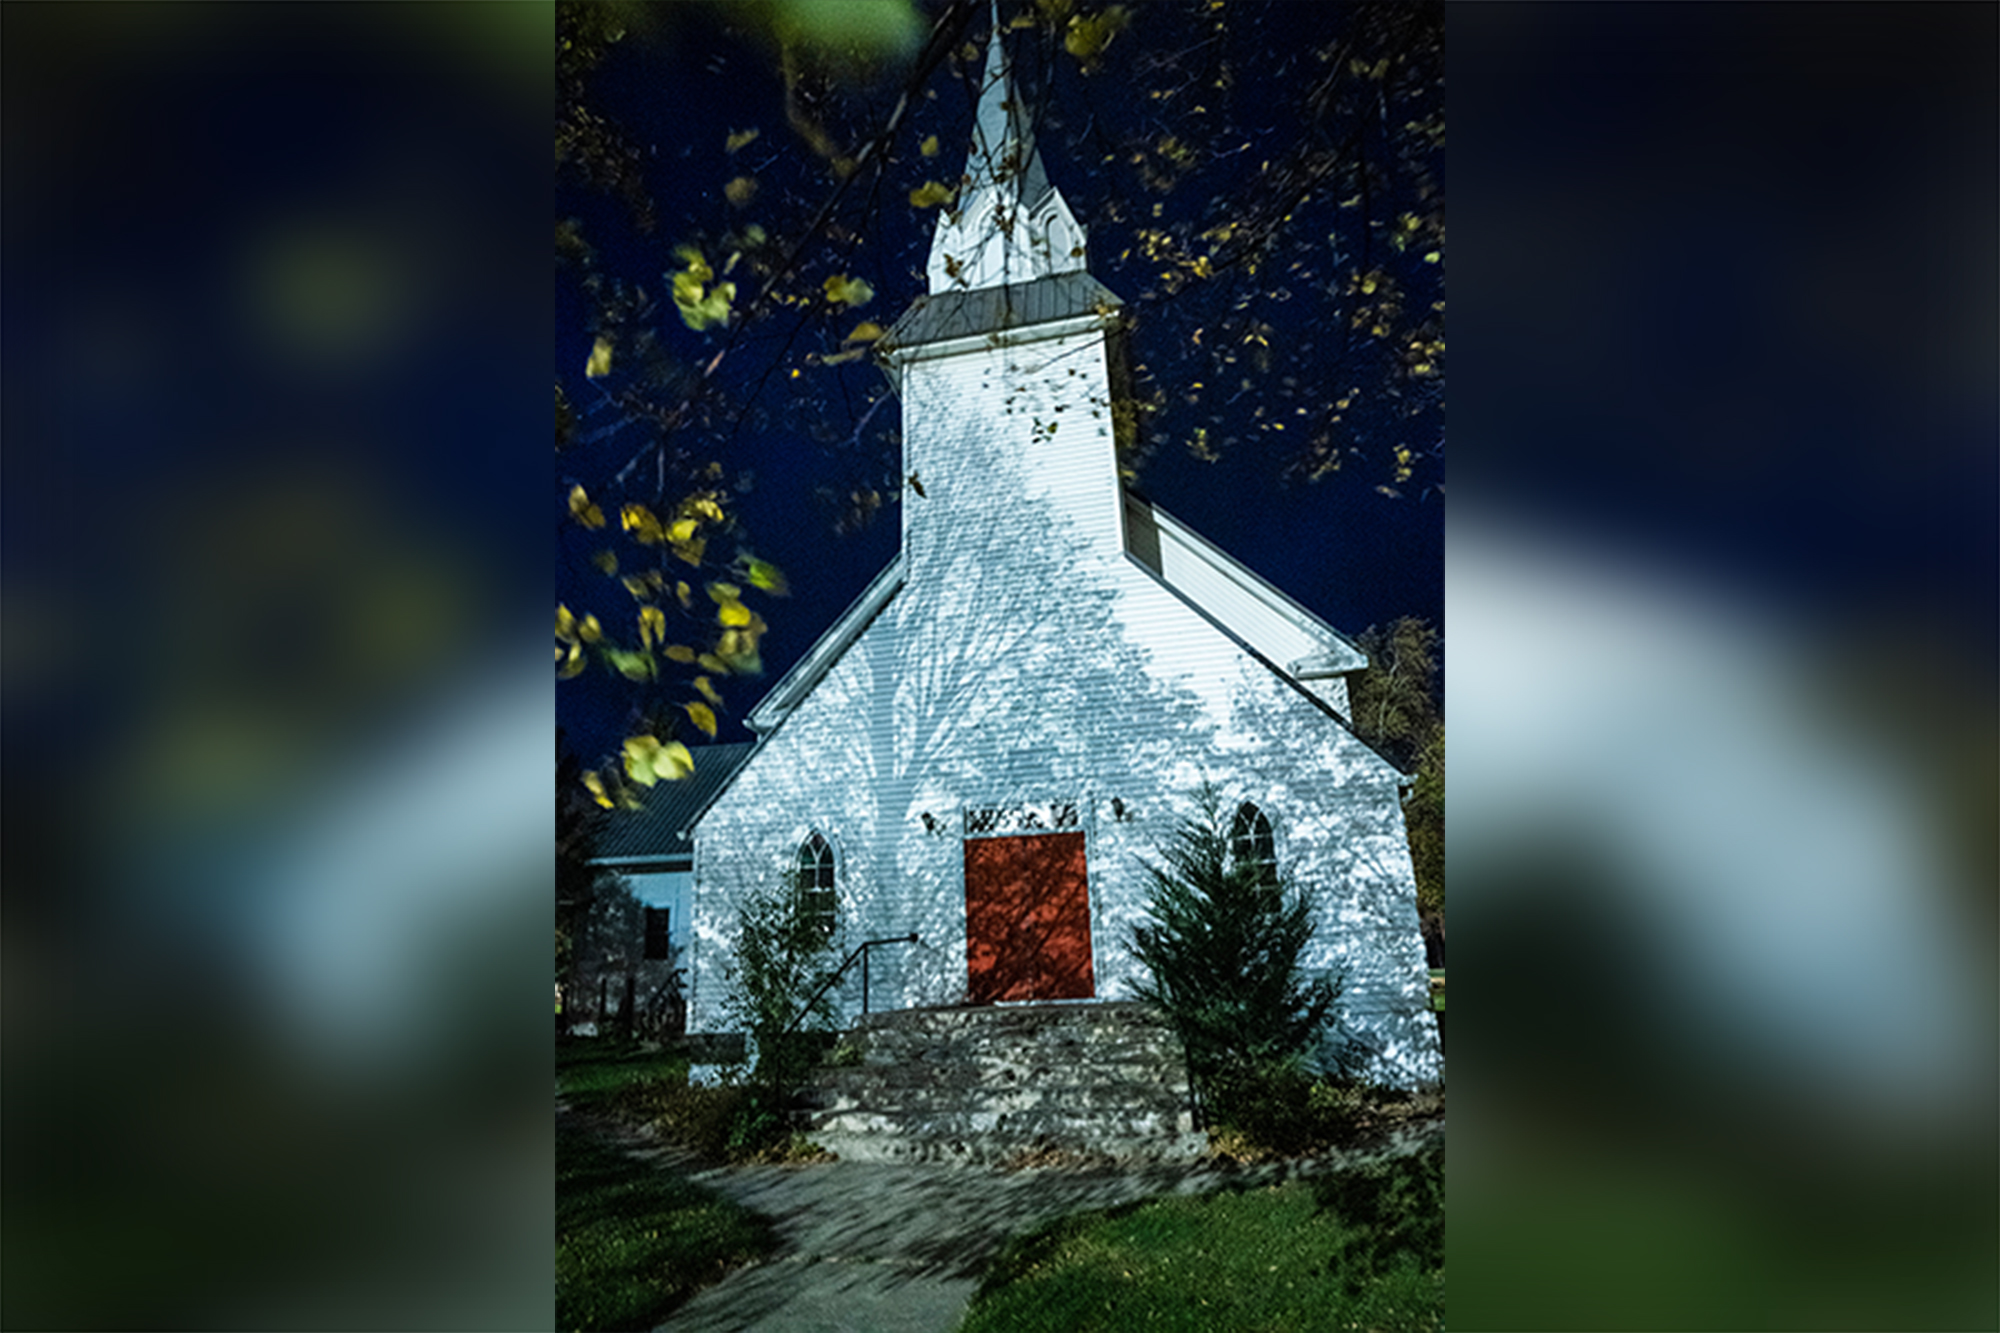 Minnesota town votes to allow white supremacist church